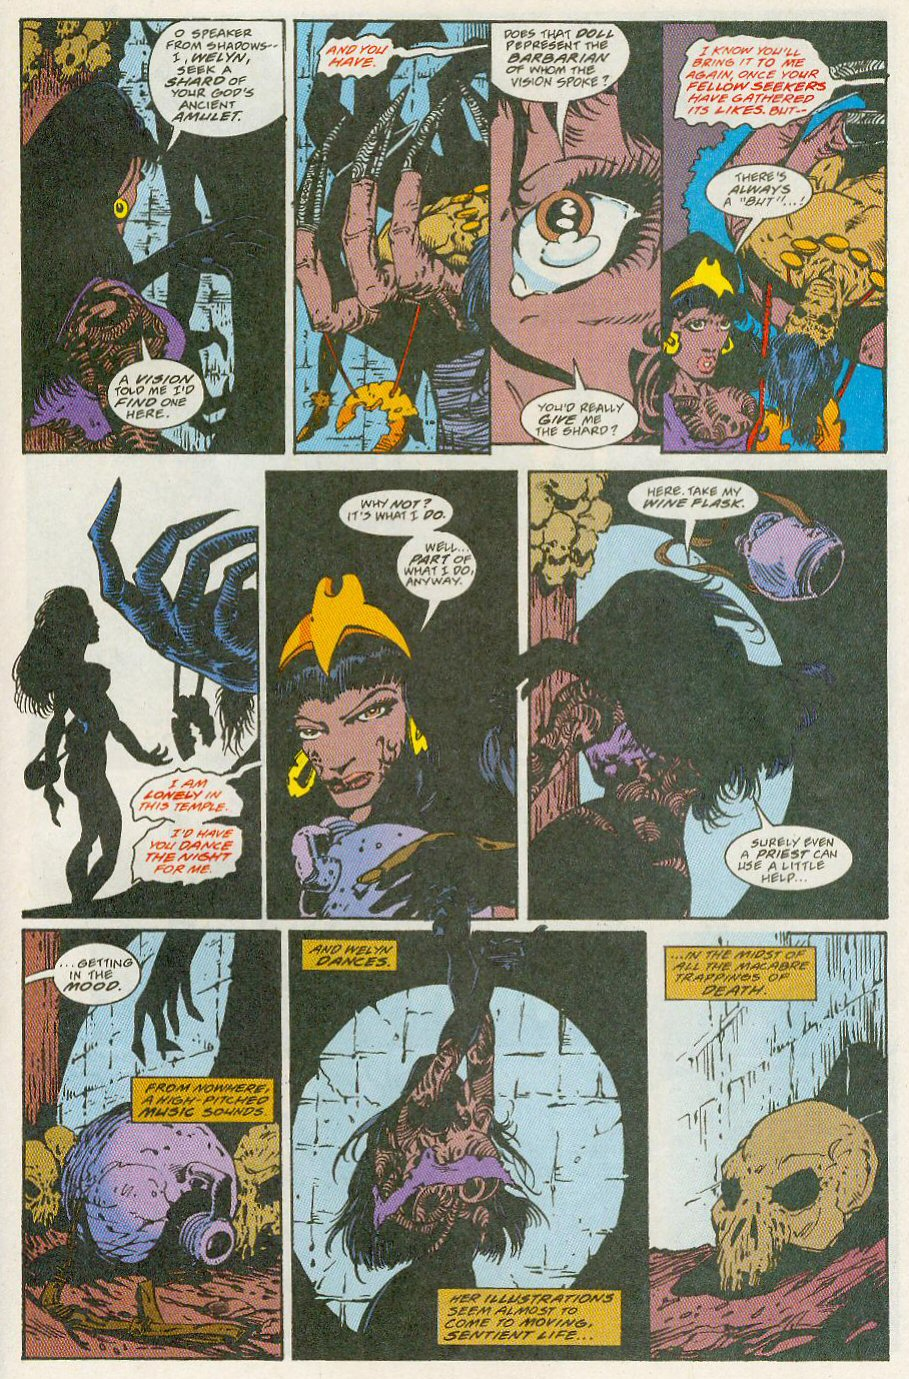 Read online Conan the Adventurer comic -  Issue #13 - 23